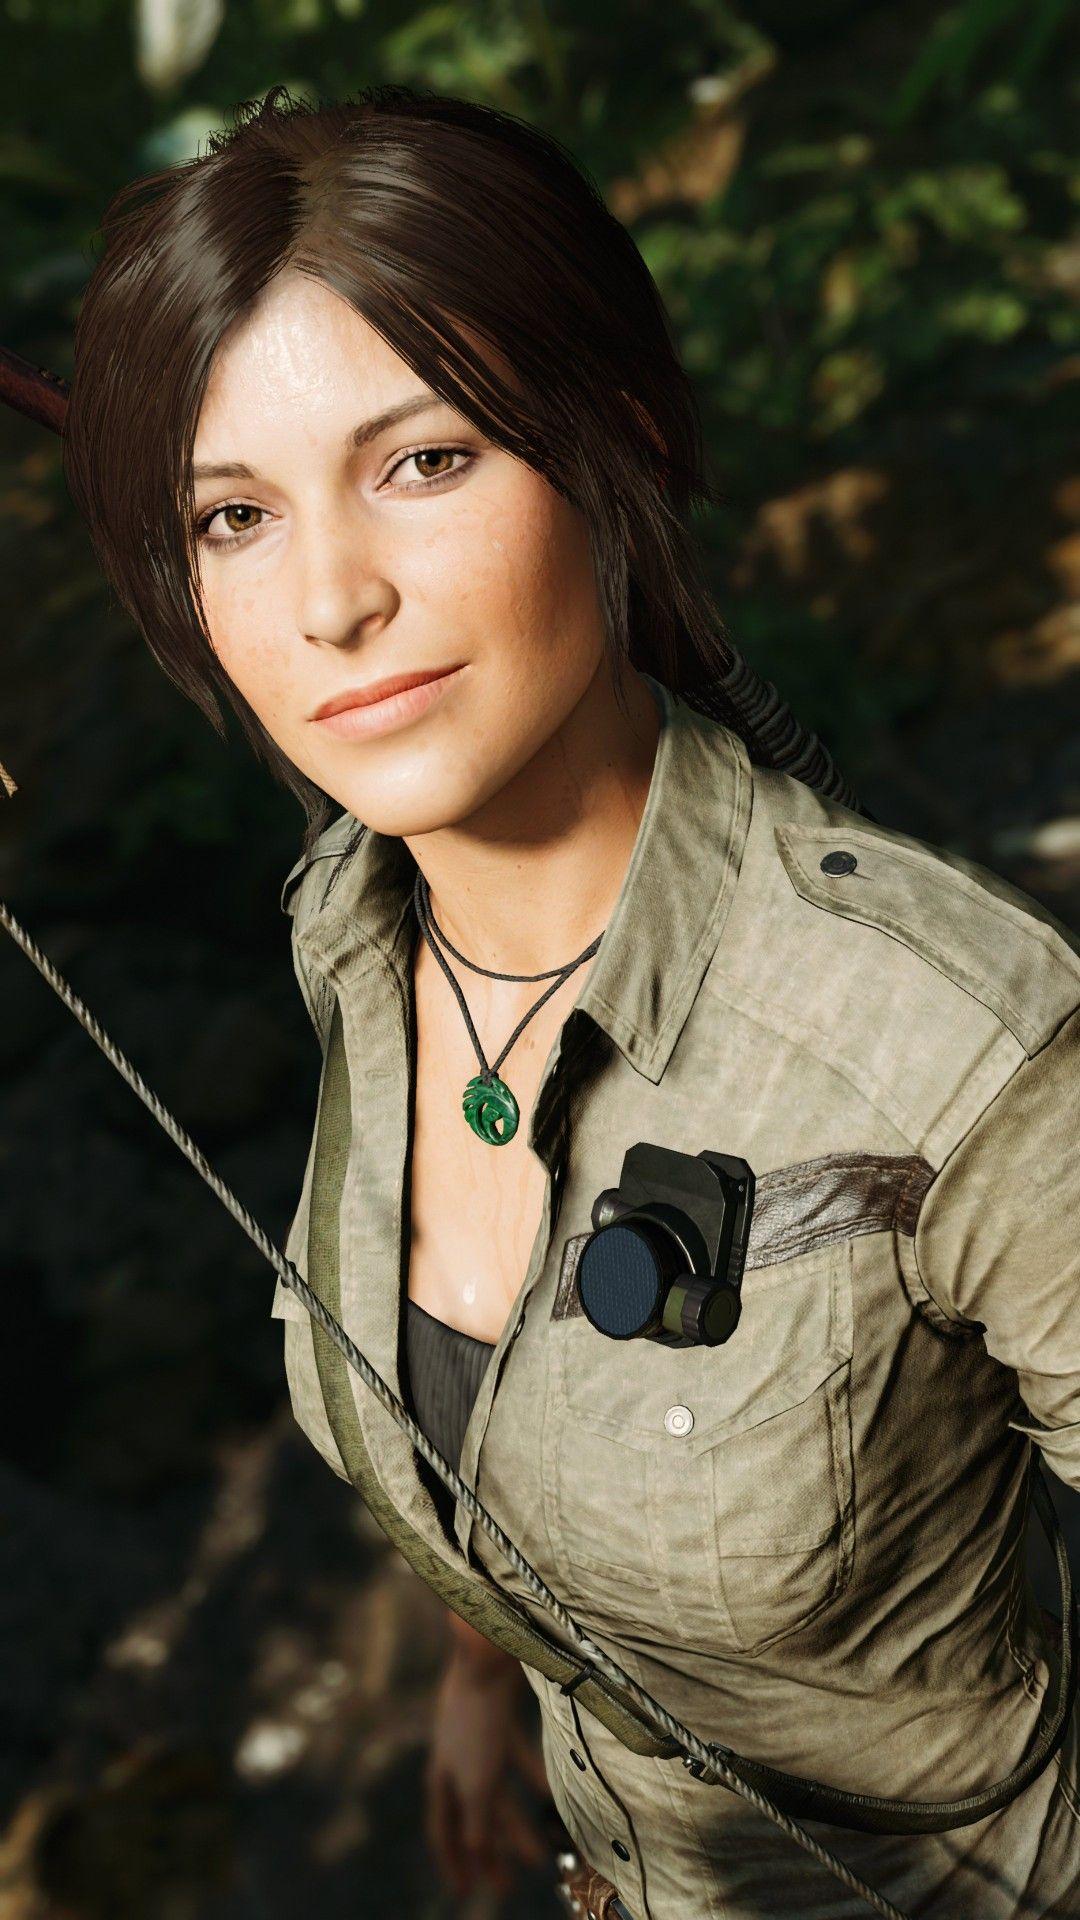 Lara Croft #tombraider #LaraCroft   Tomb raider lara croft